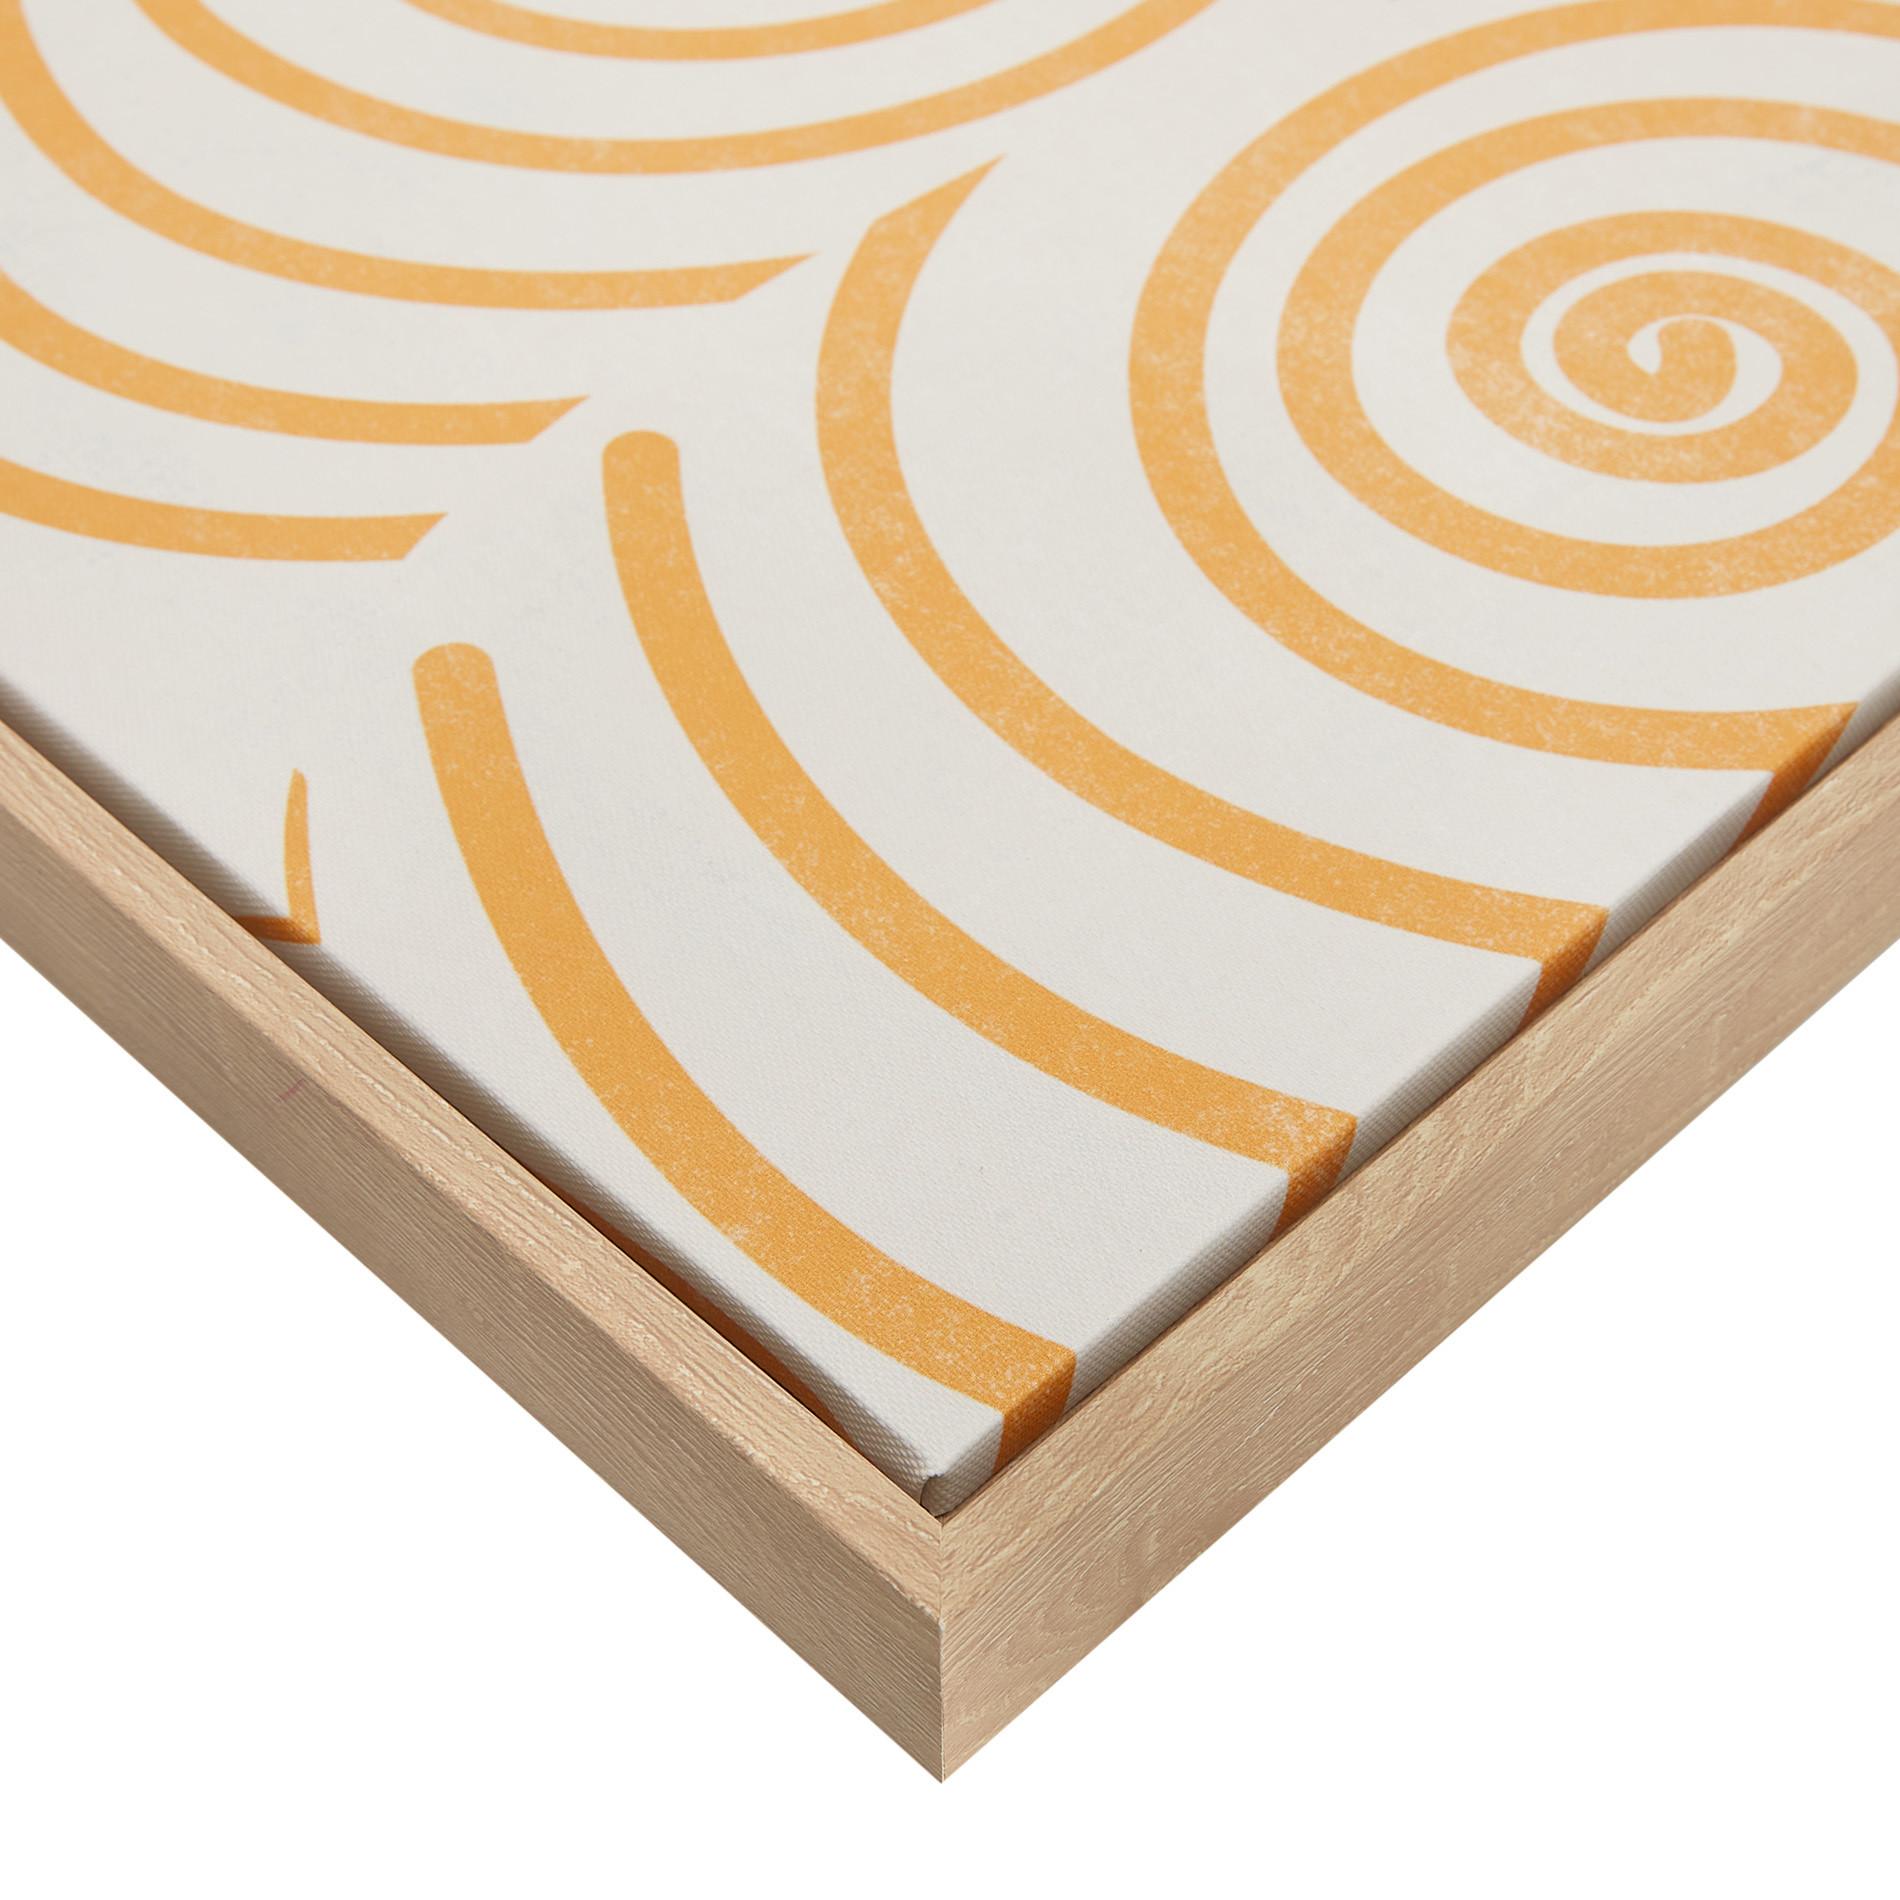 Tela con stampa fotografica sabbia, Multicolor, large image number 1